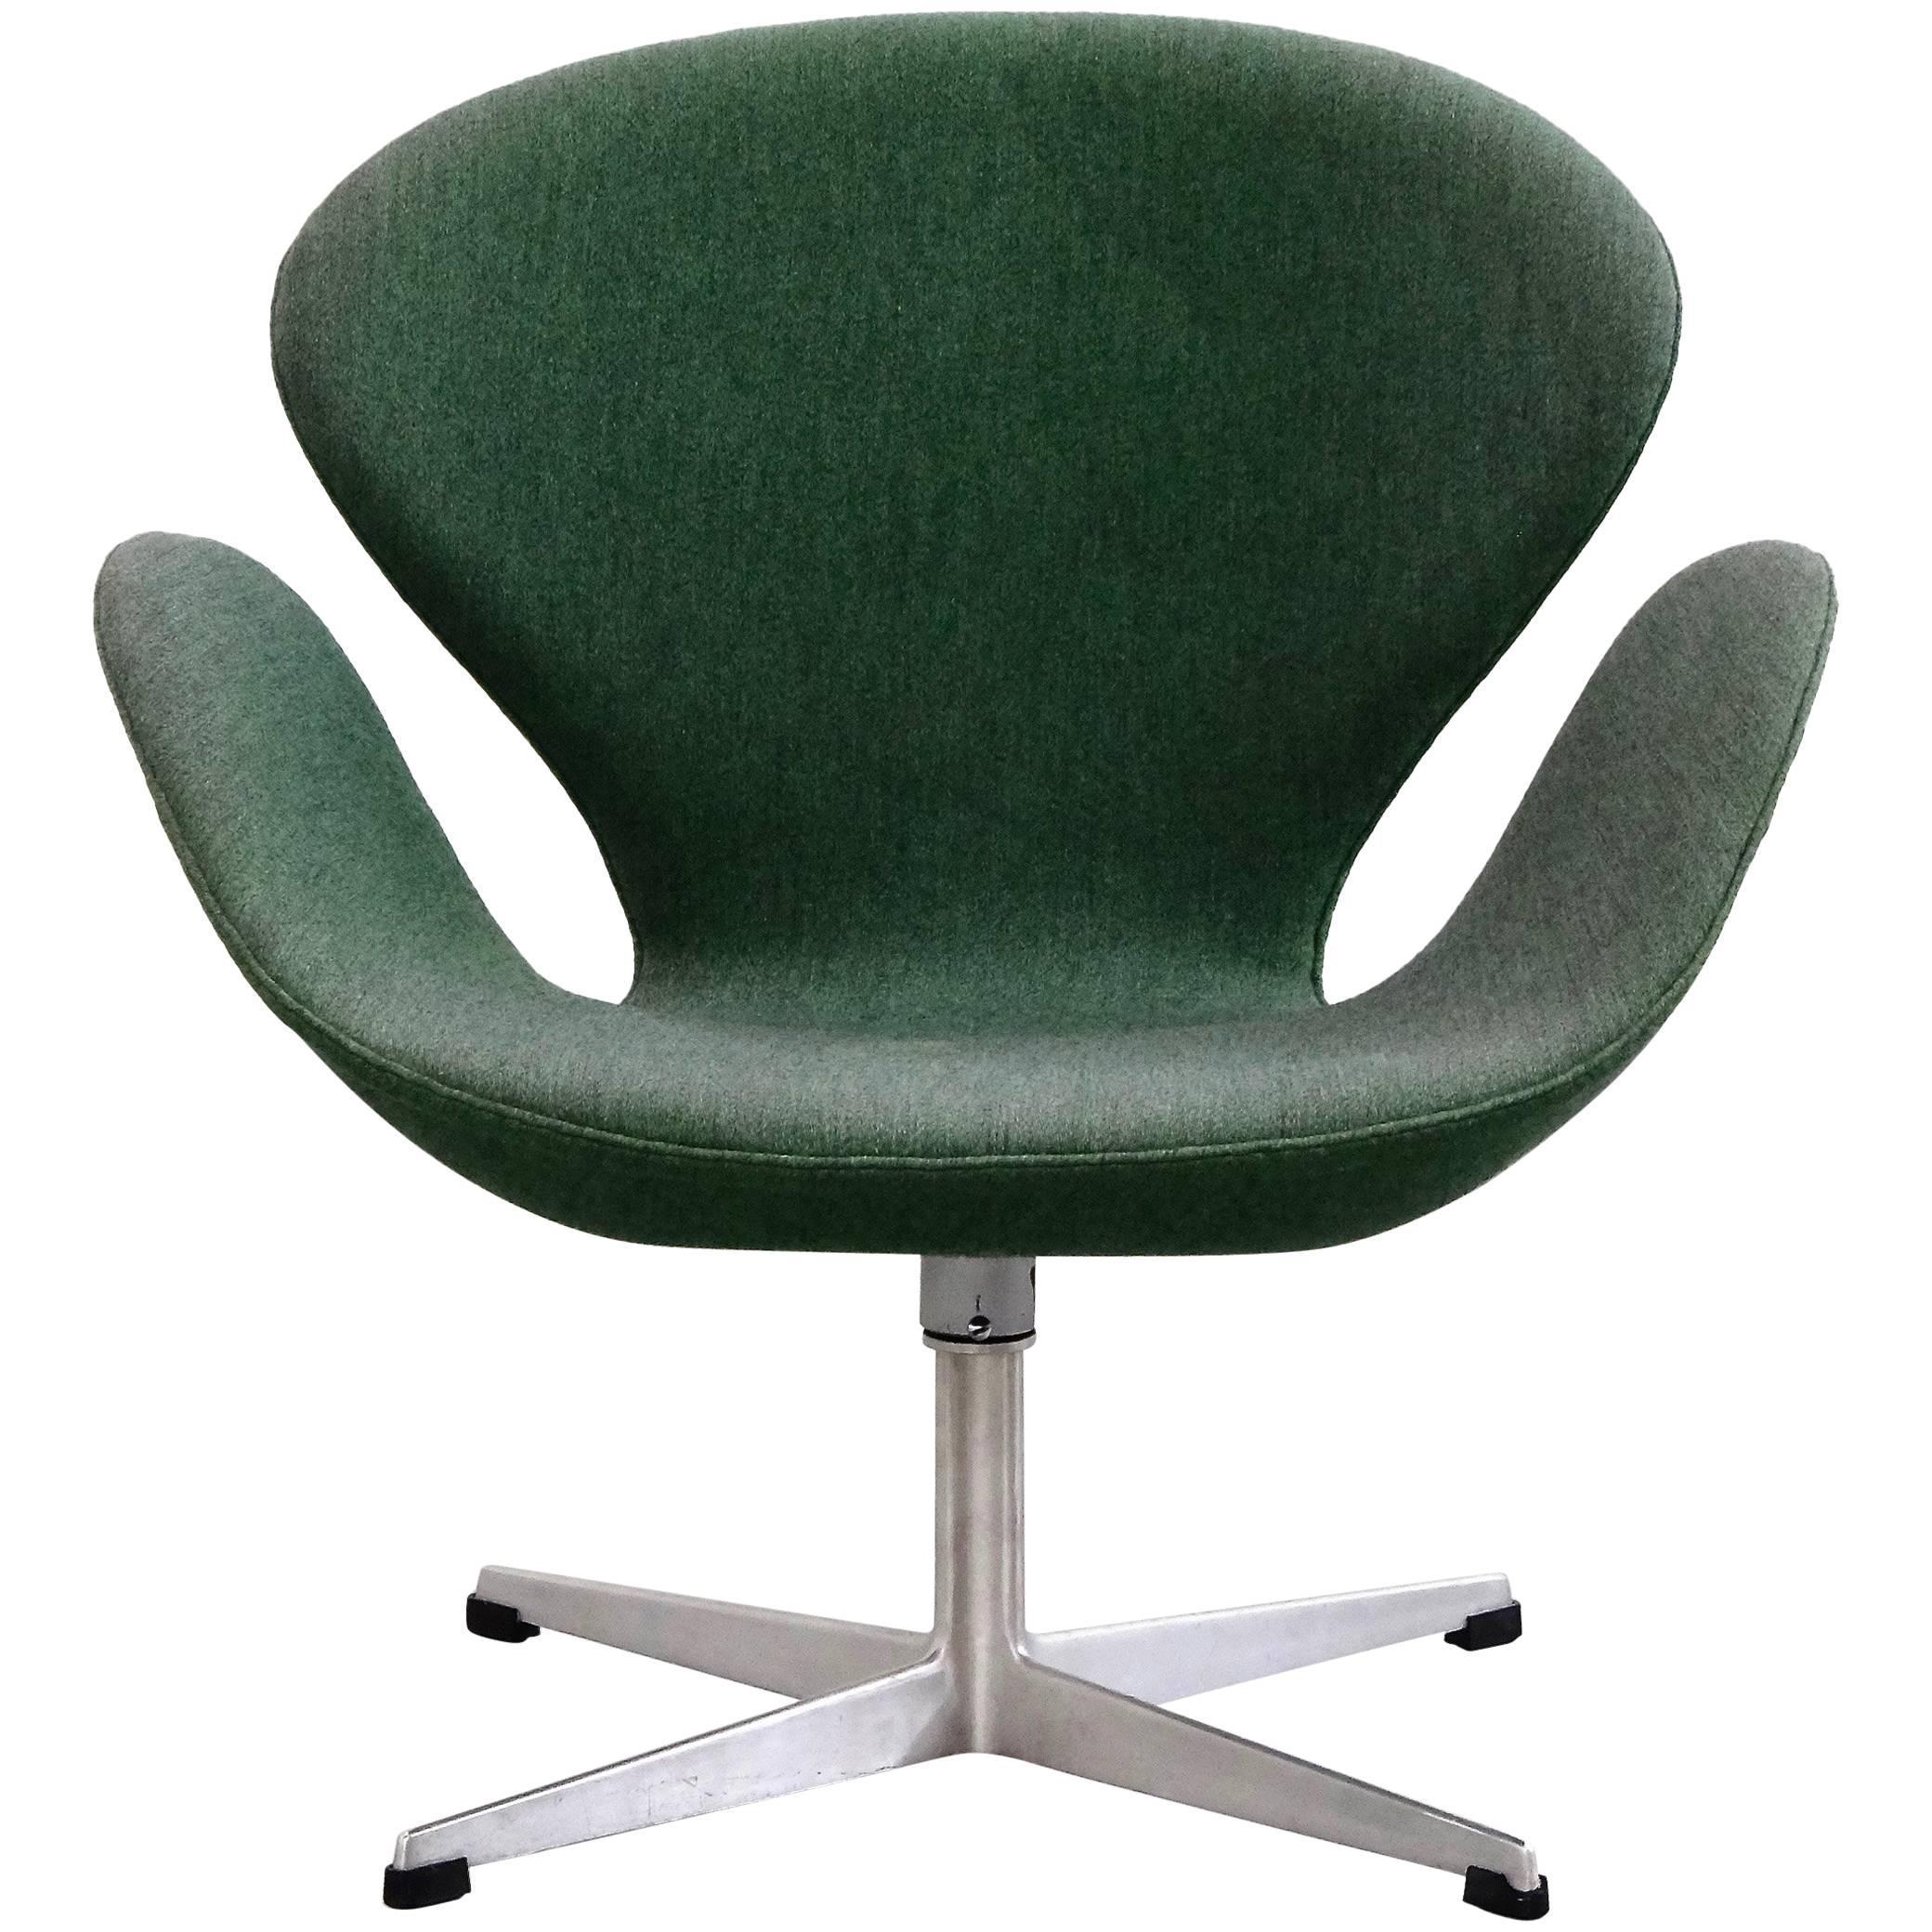 1960s Arne Jacobsen Swan Chair in Original Vintage Two-Tone Green Wool For Sale  sc 1 st  1stDibs & 1960s Arne Jacobsen Swan Chair in Original Vintage Two-Tone Green ...